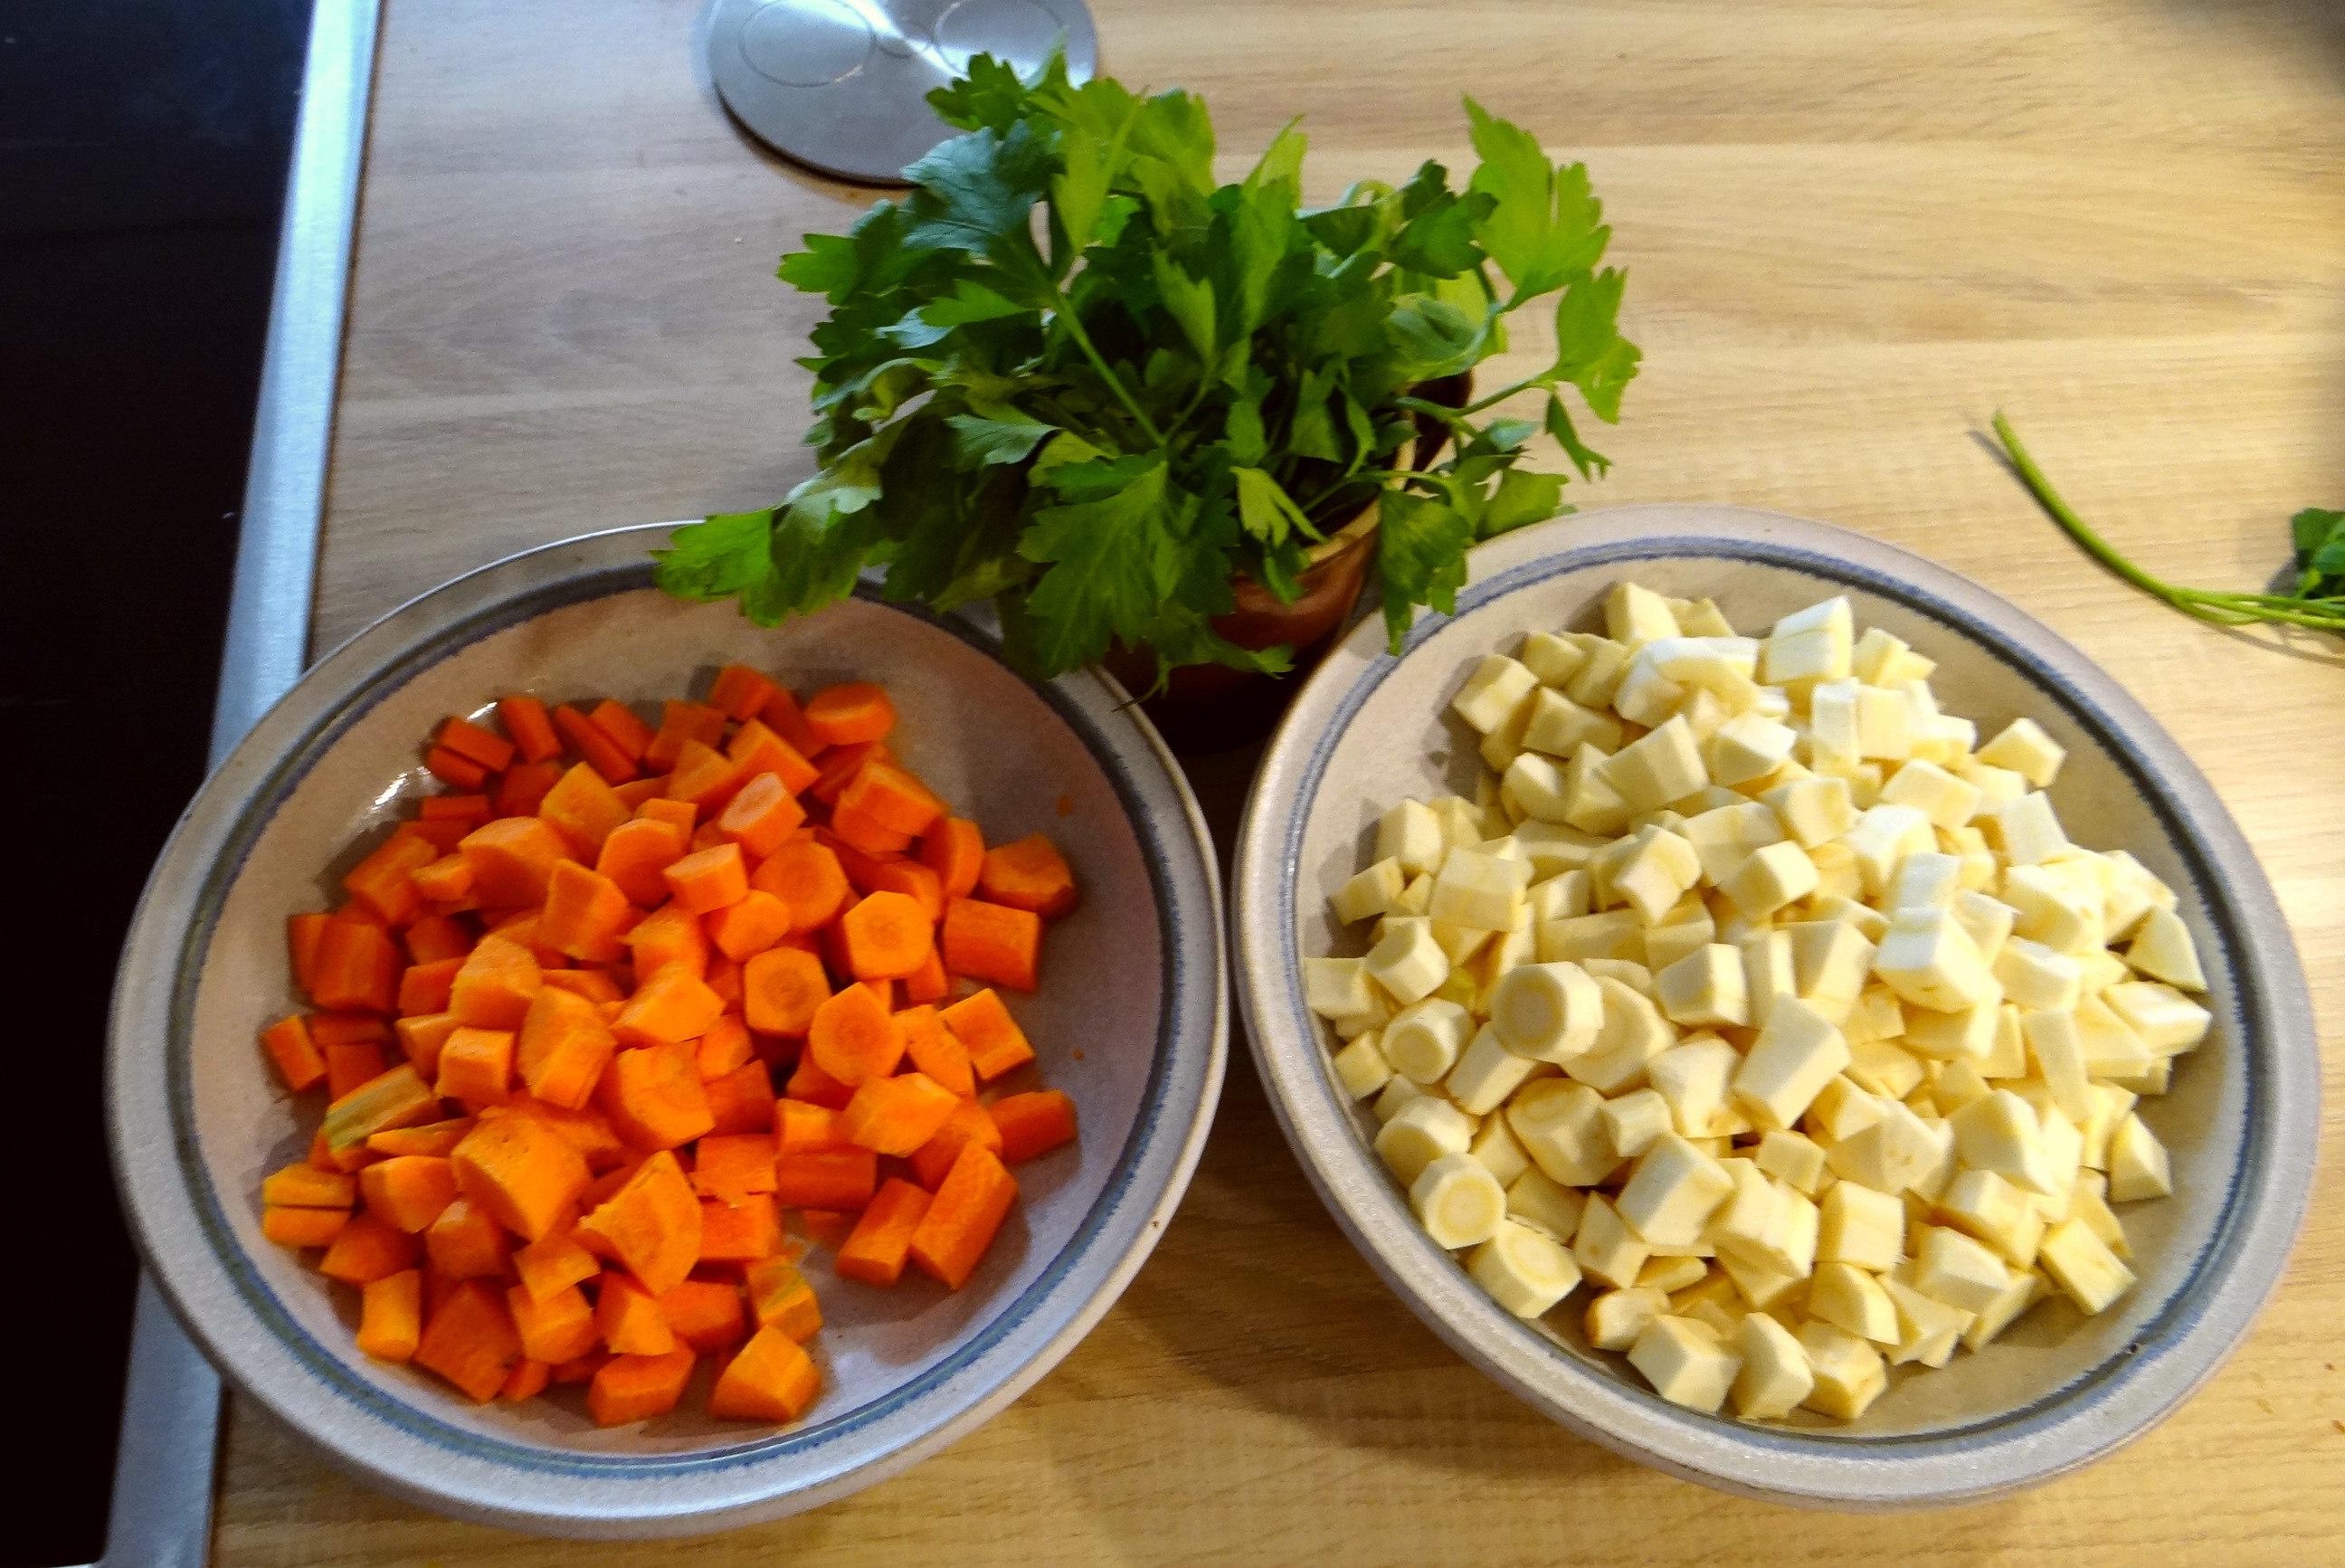 One Pot Pastinaken,Möhren,Kartoffeln (3)